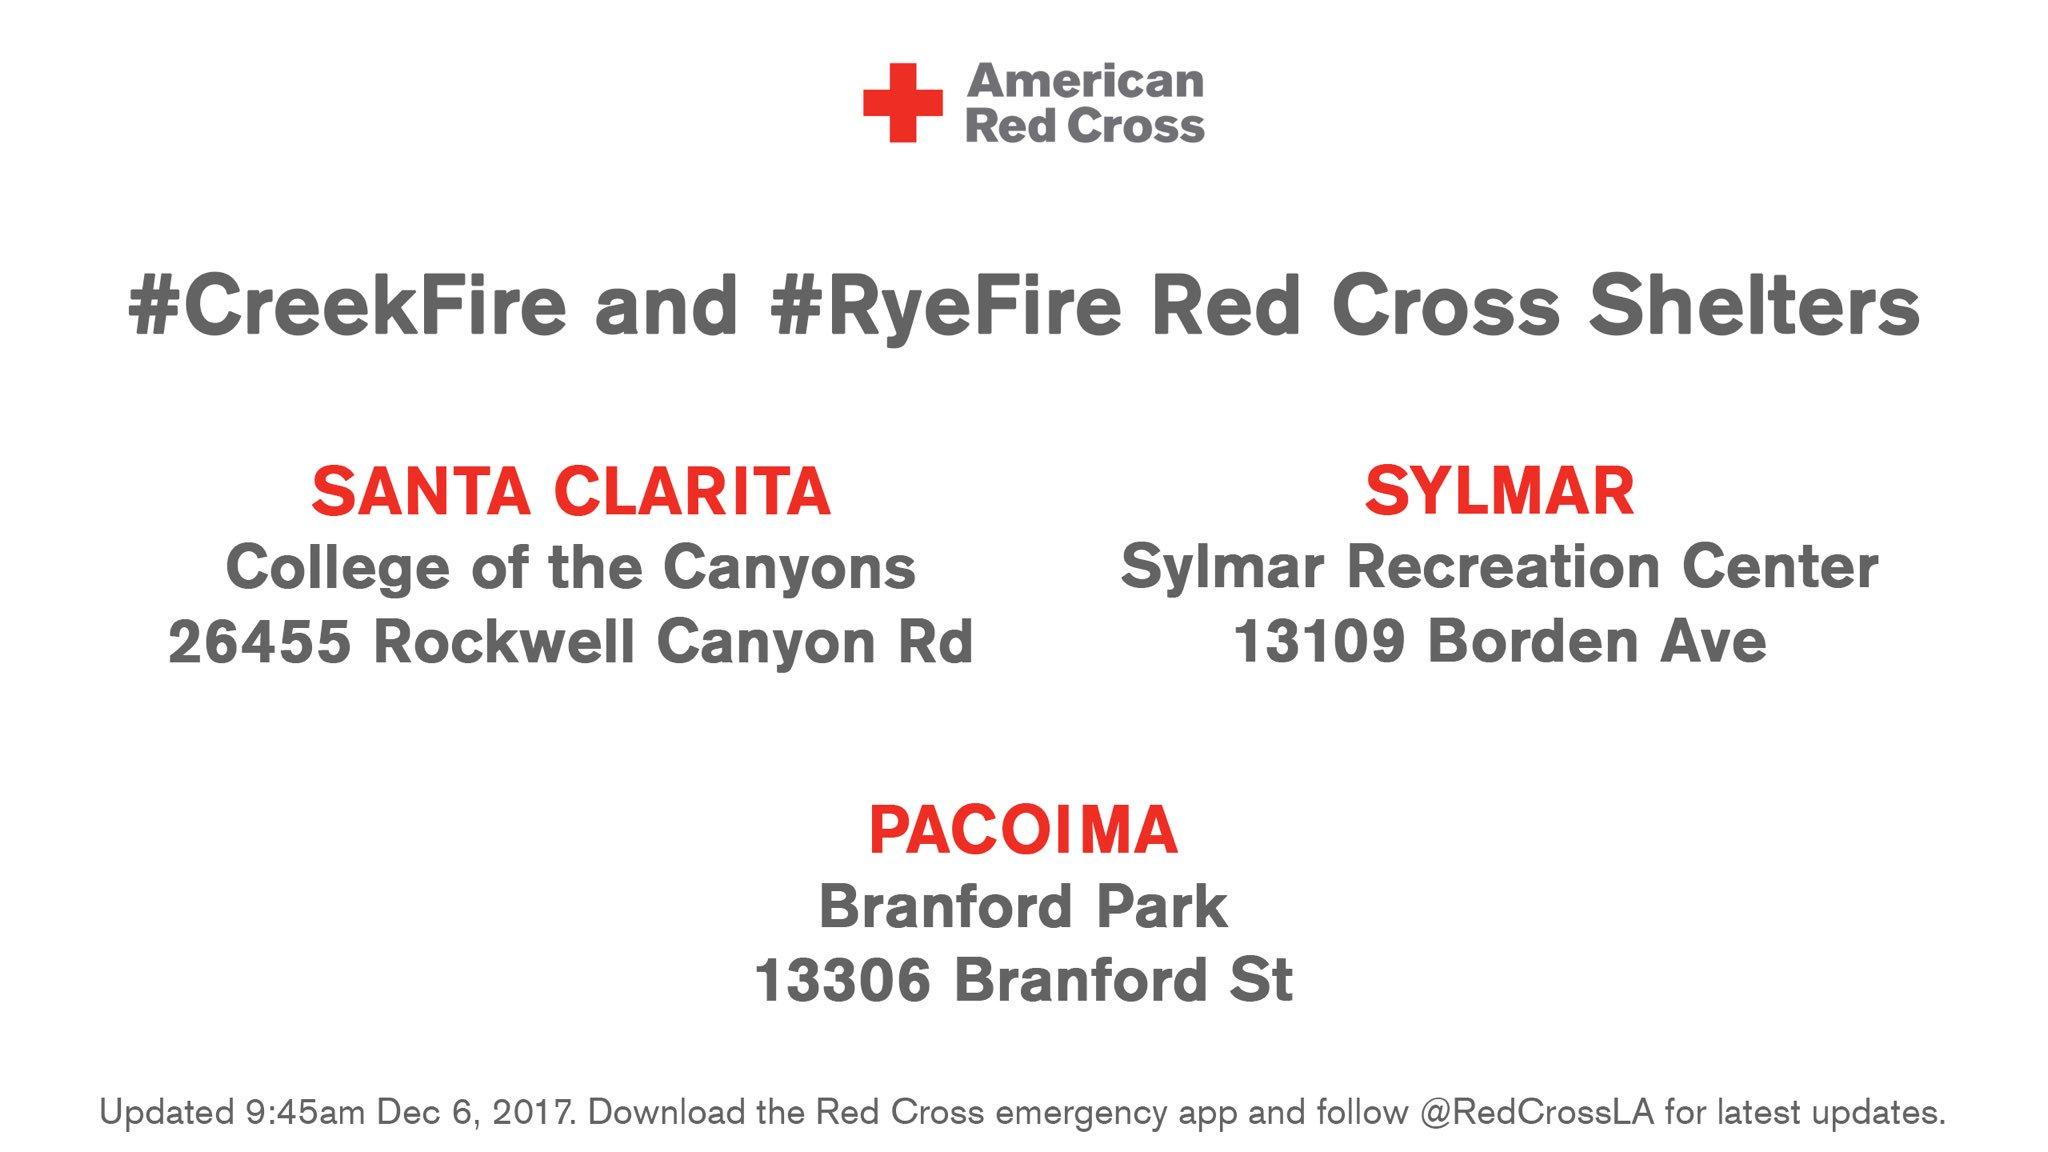 Red Cross Los Angeles on Twitter: